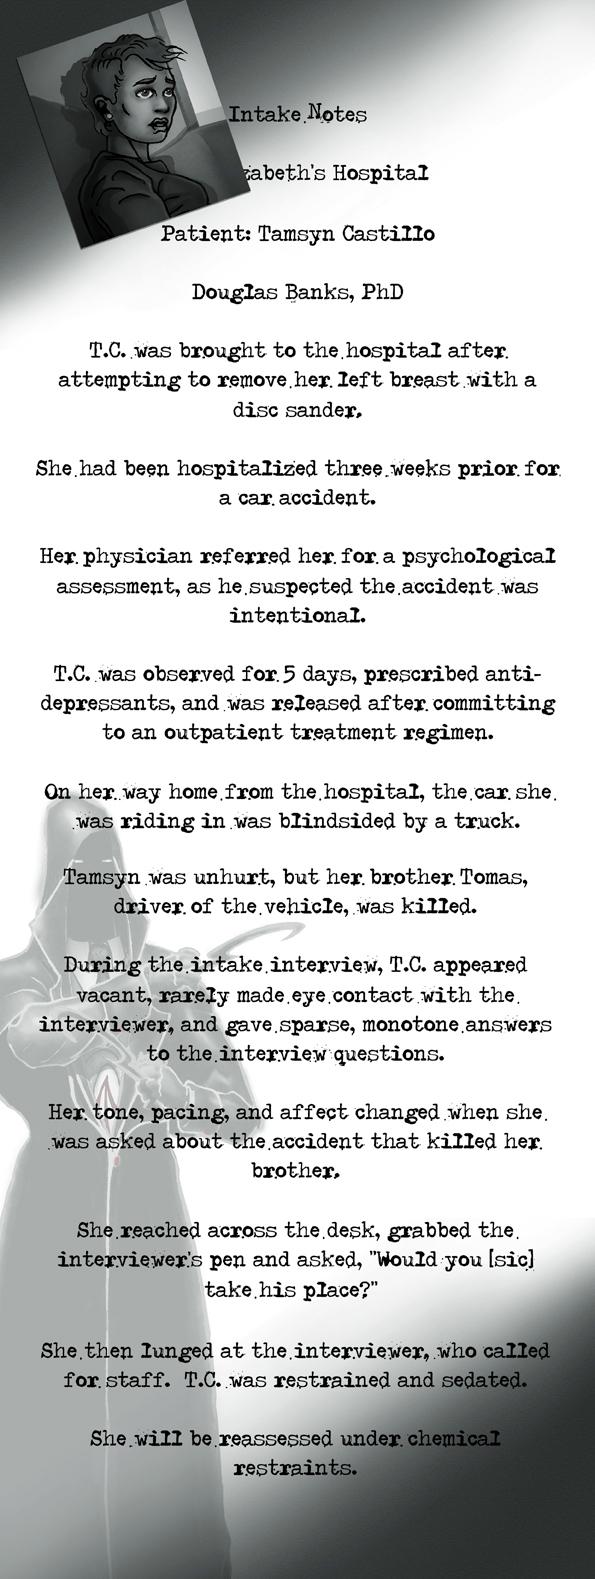 Hospital intake notes for Tamsyn Castillo - THE FLOOD ~ a salvation myth - Shadowmark Productions